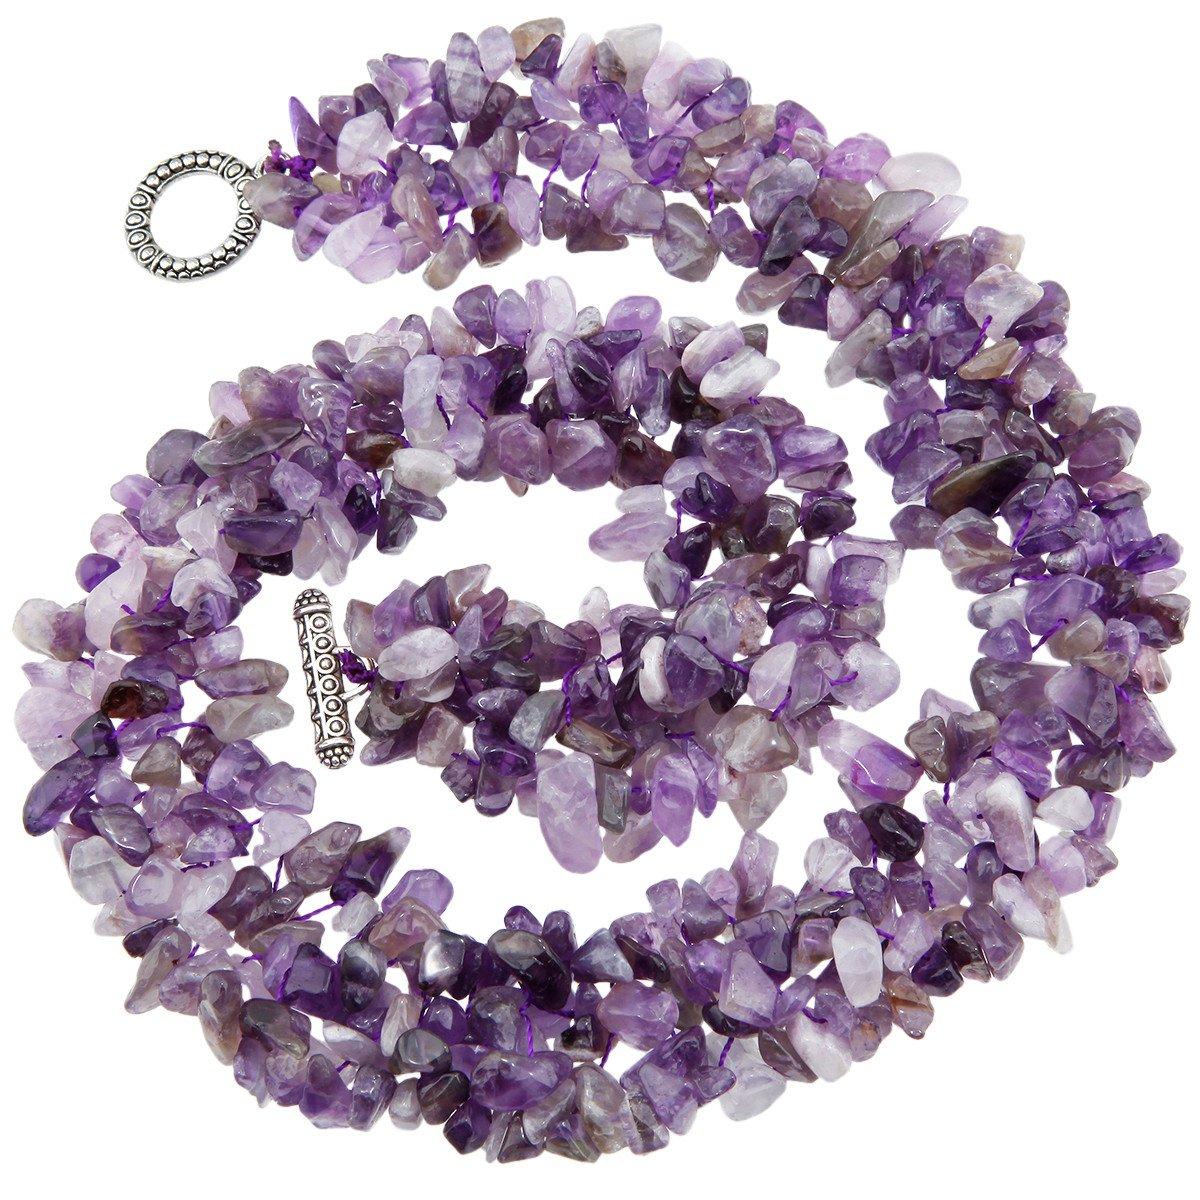 SUNYIK Purple Amethyst Tumbled Stone Bib Necklace Collar Choker Strands 17.5 inches by SUNYIK (Image #3)